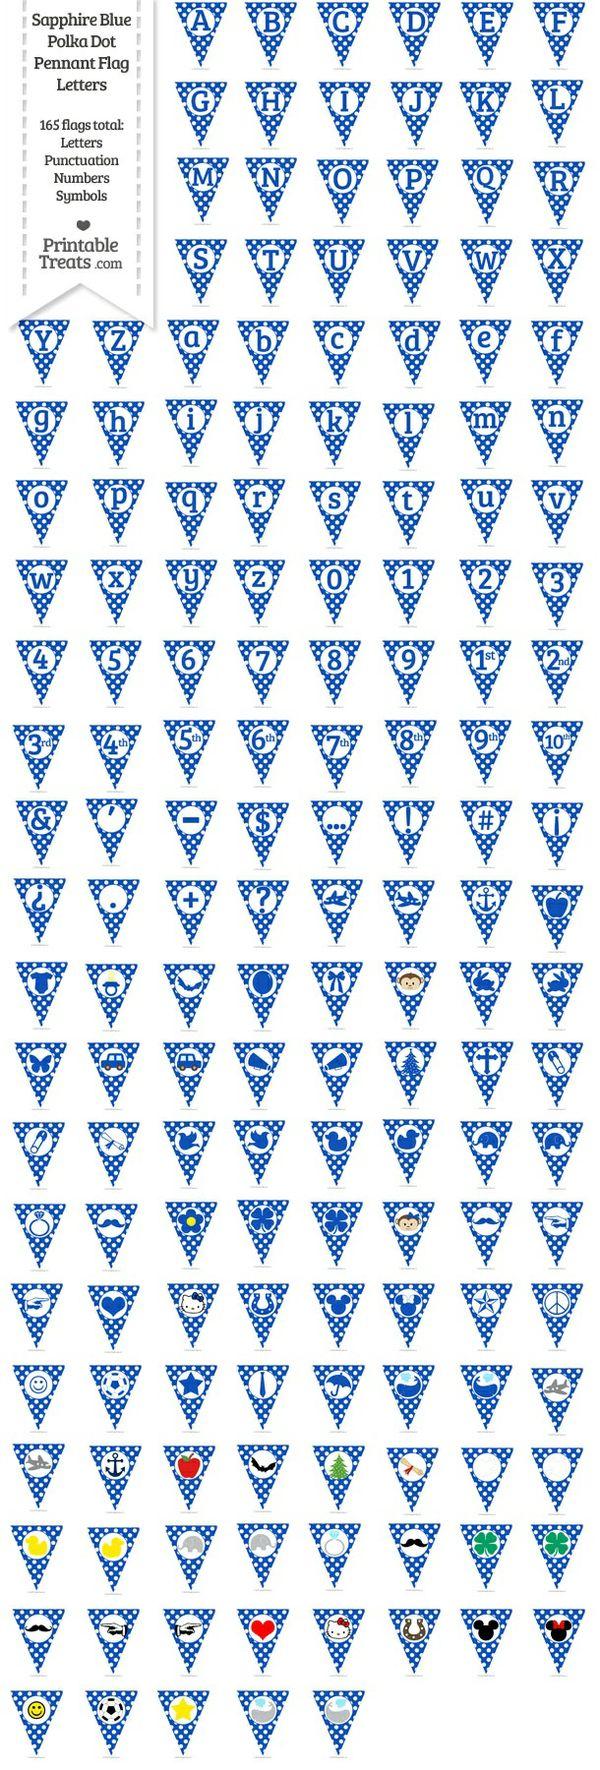 165 Sapphire Blue Polka Dot Pennant Flag Letters Password